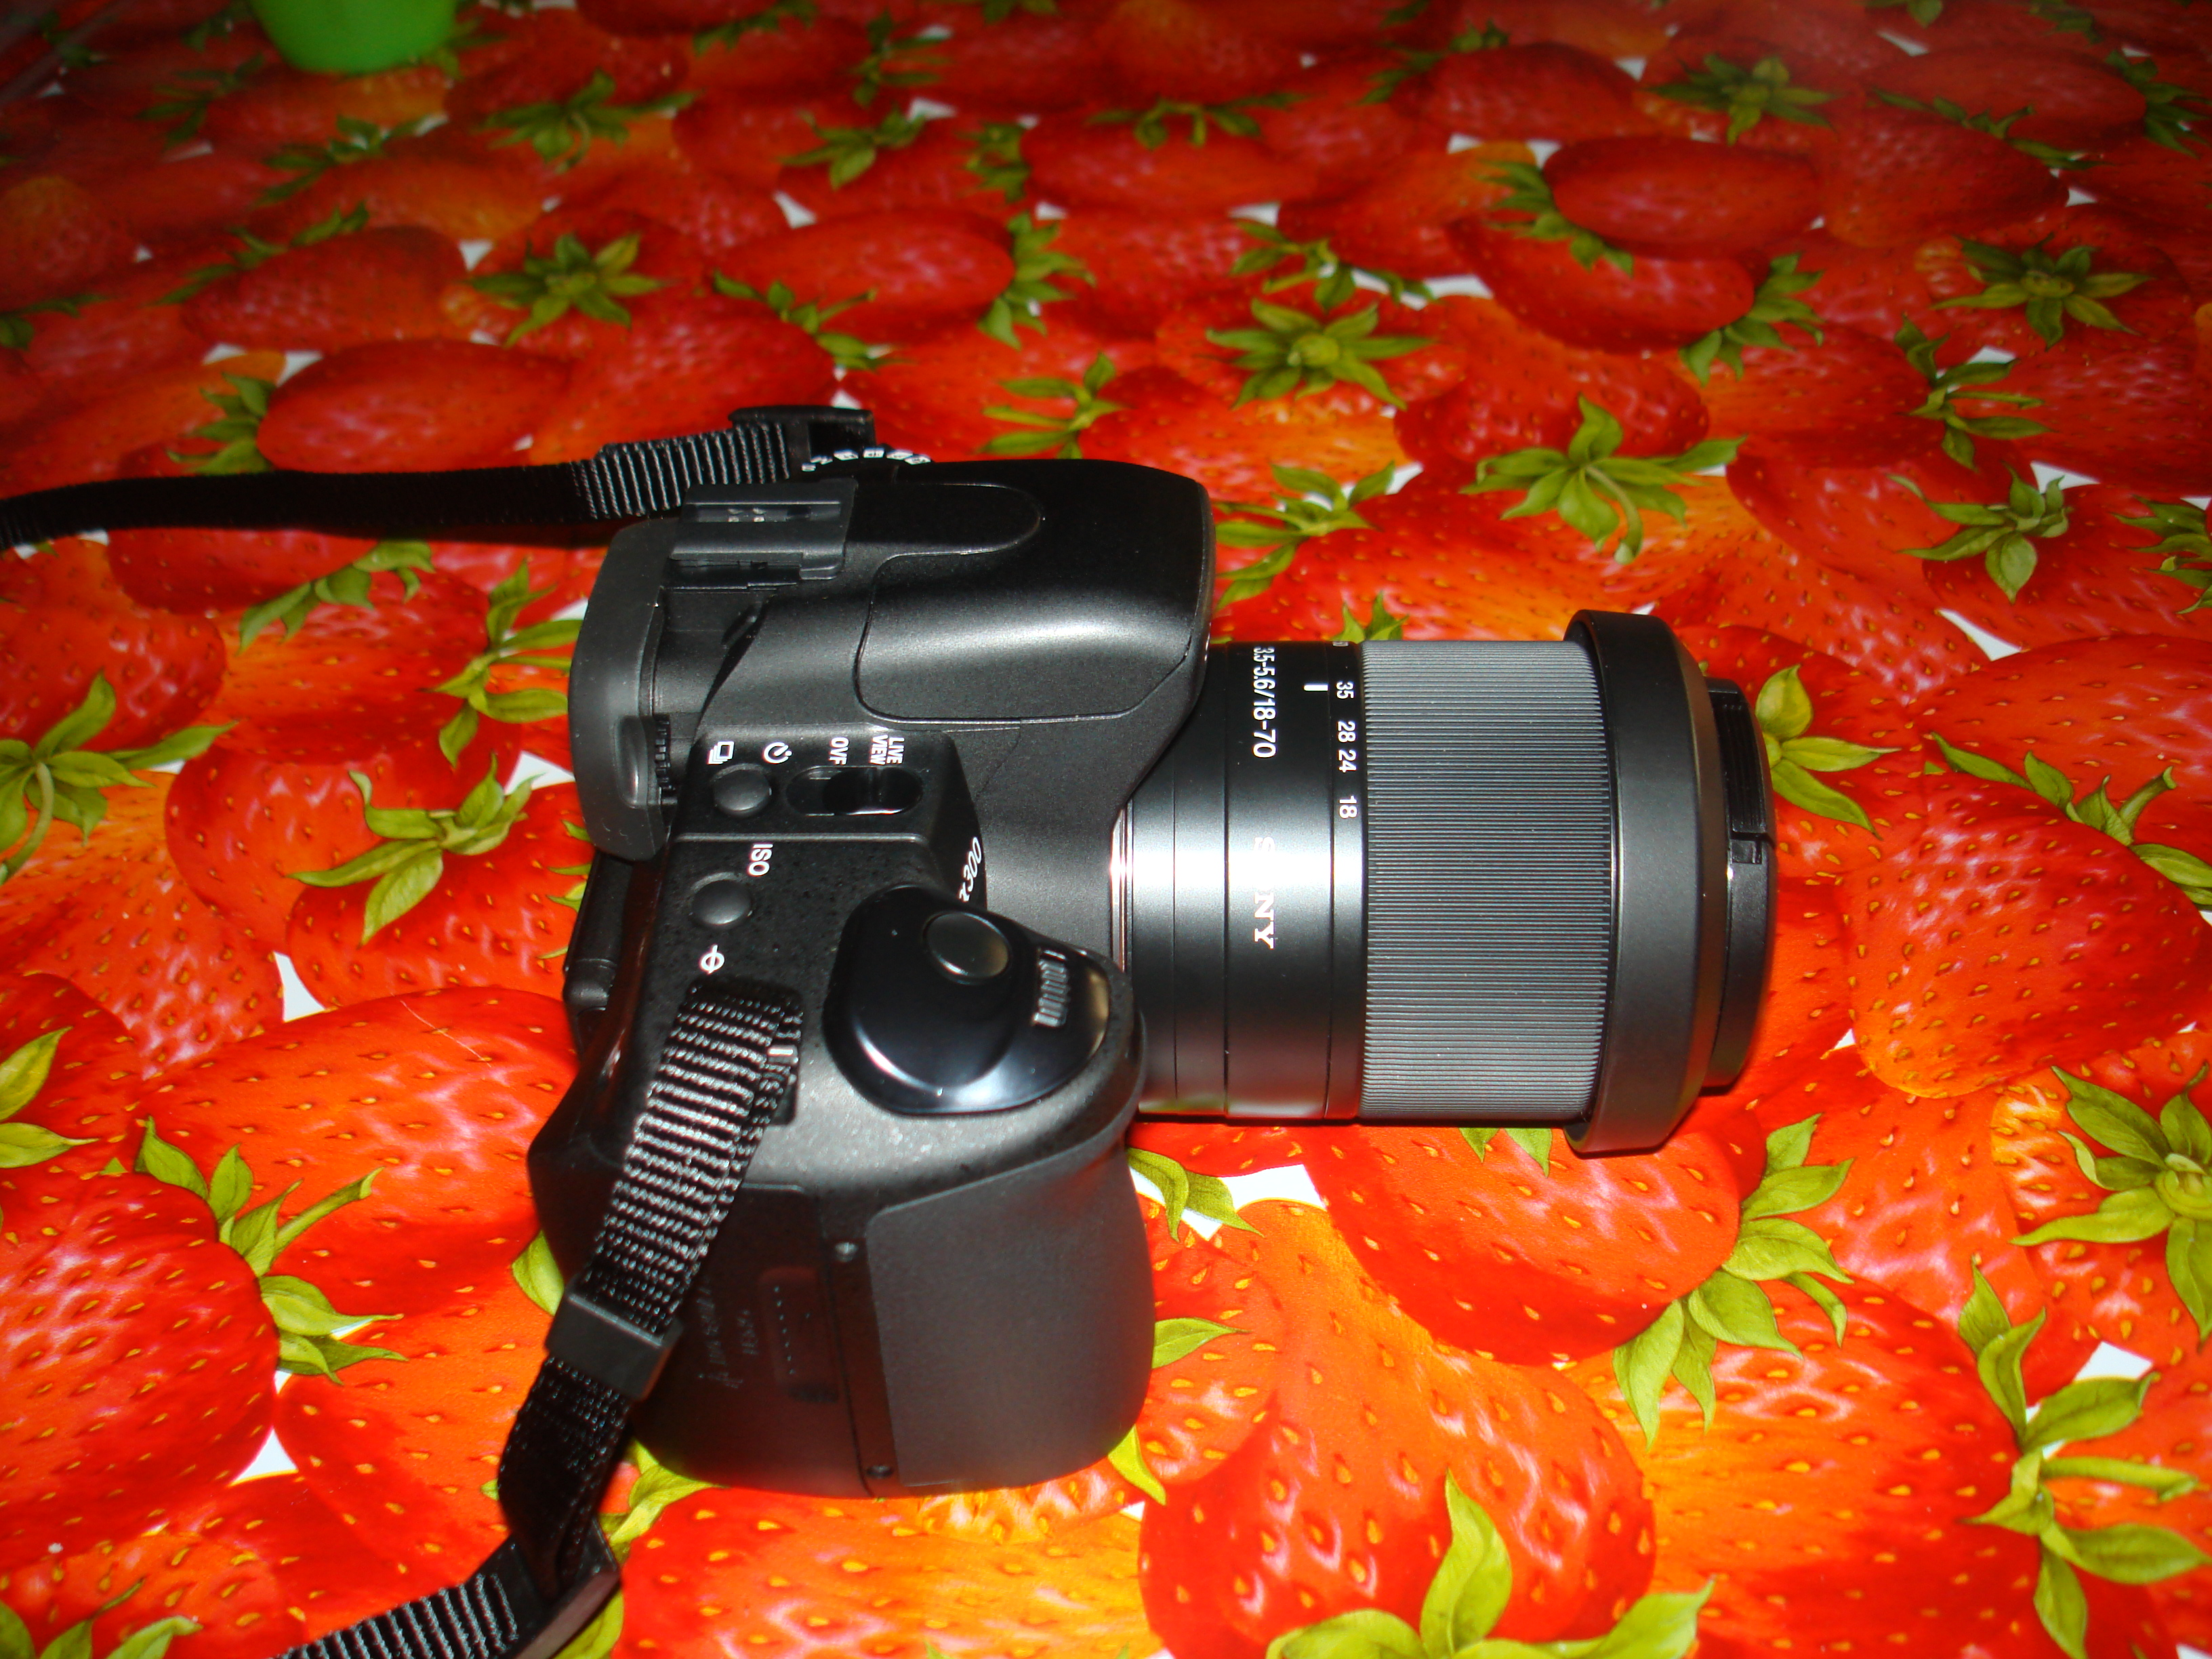 Camera Sony Dslr A300 Camera filesony dslr a300 2 jpg wikimedia commons jpg